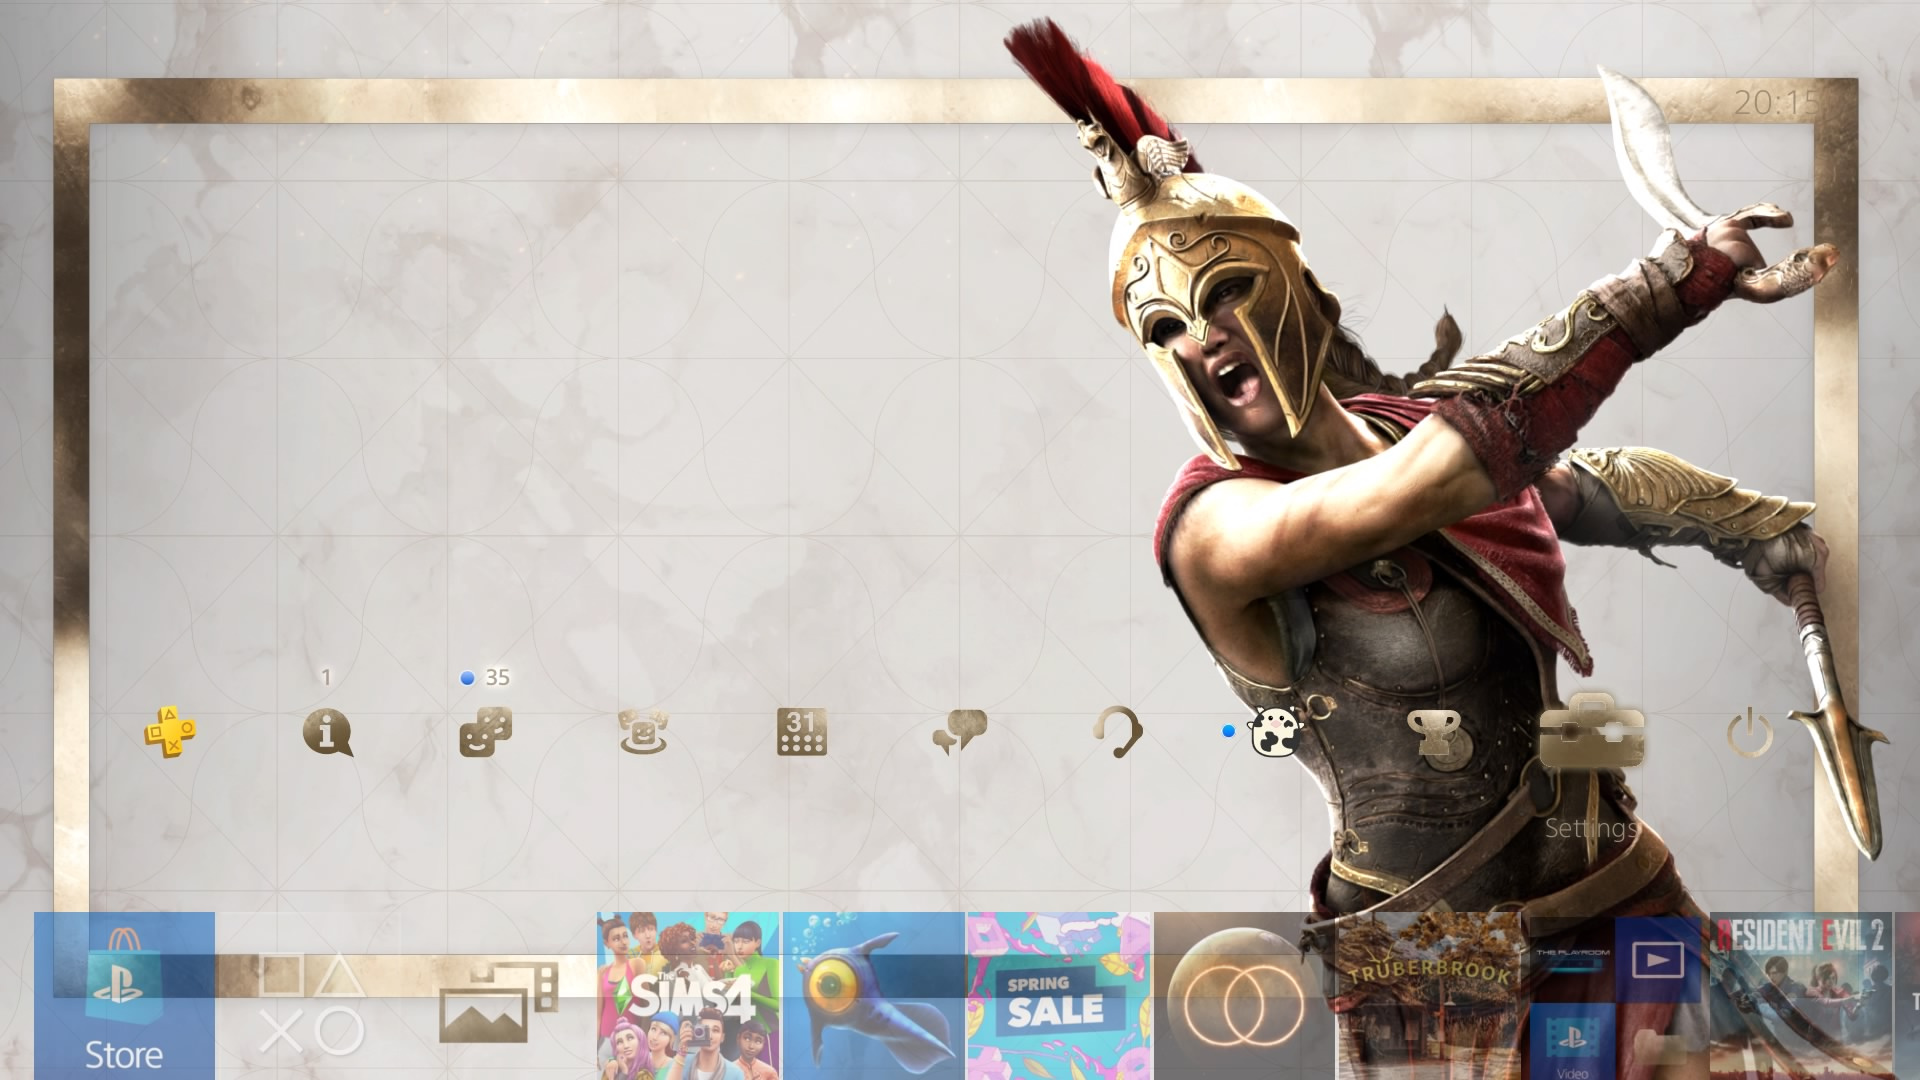 assassins creed odyssey theme.original - PlayStation 4 - Guida: i migliori temi gratuiti da scaricare